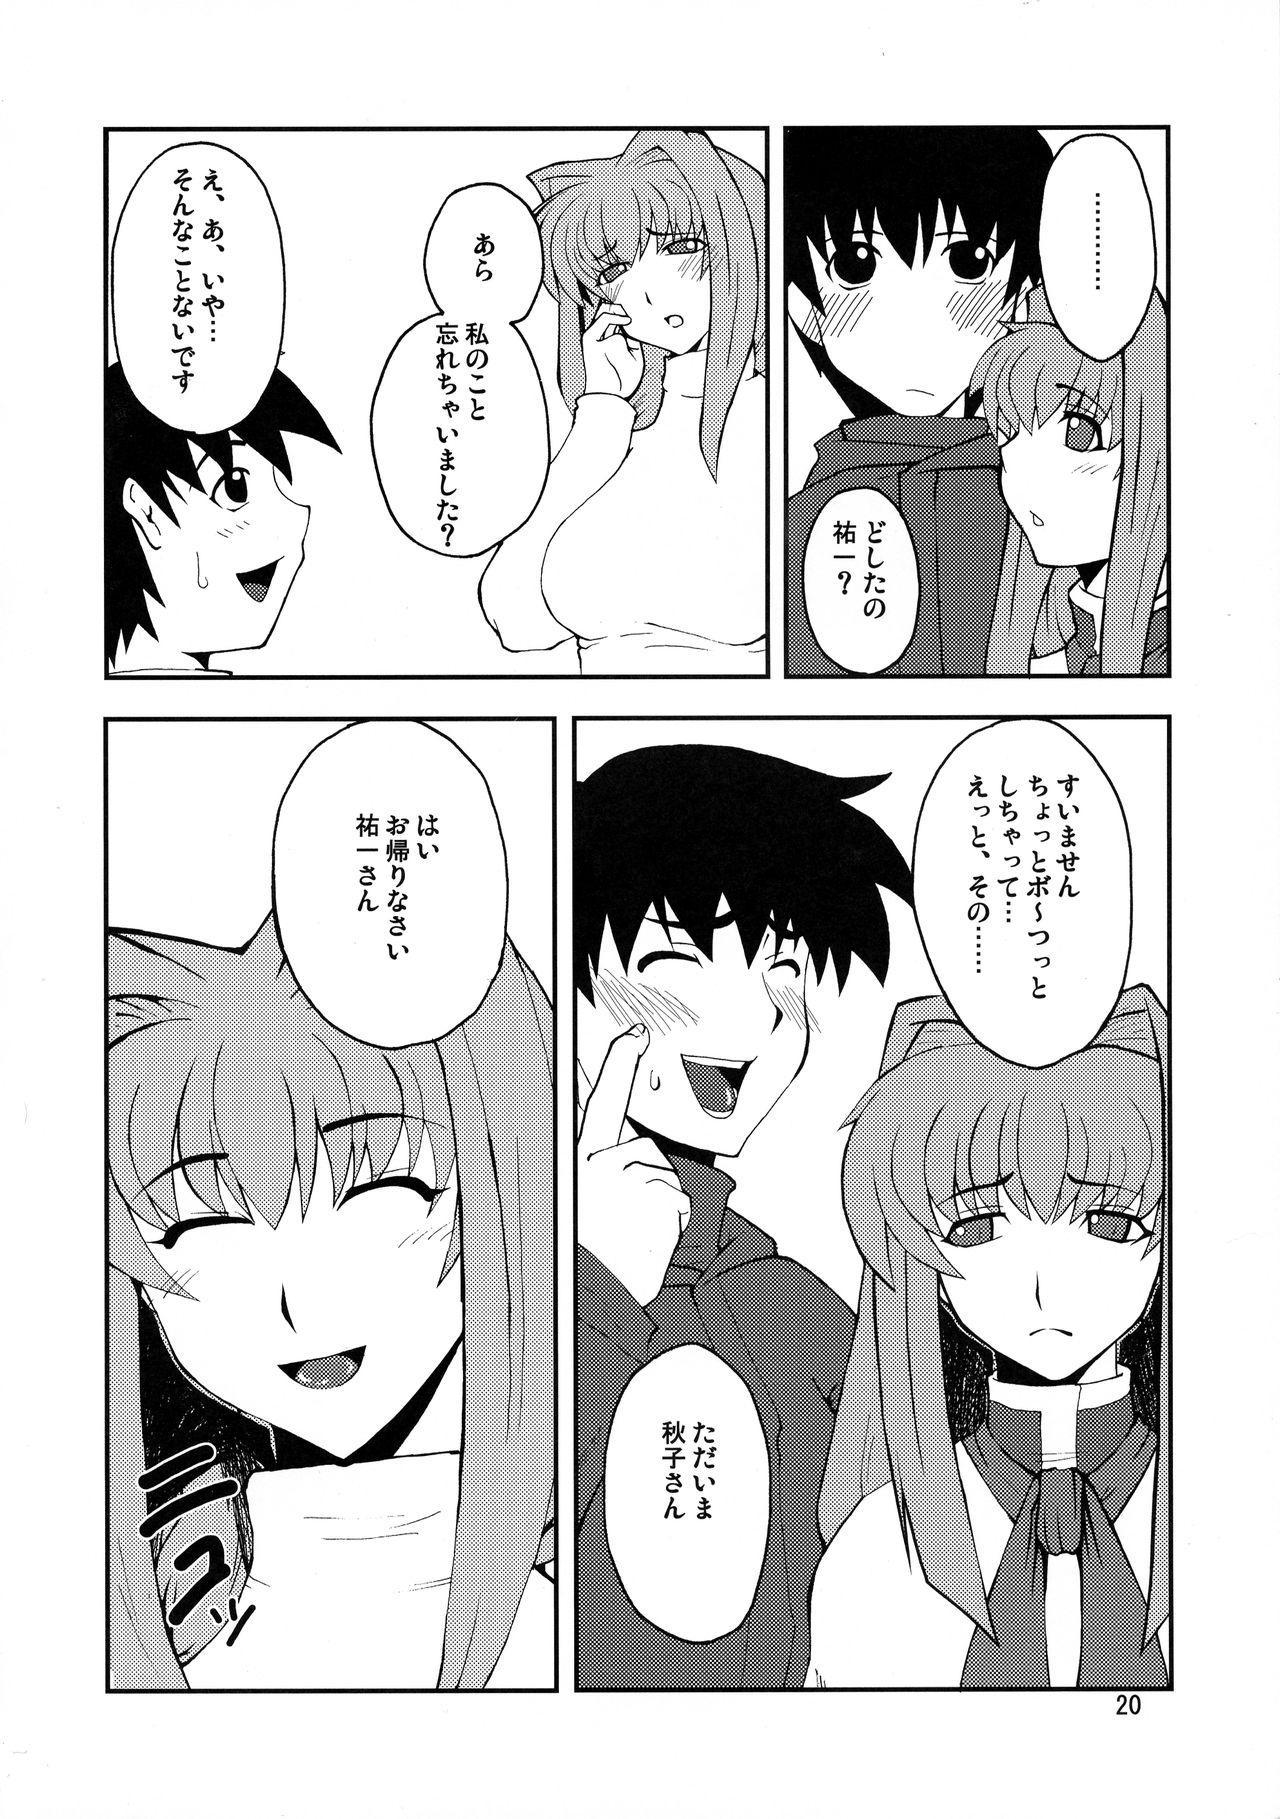 Kyouki Vol. 3~5 Remake Ver. 19